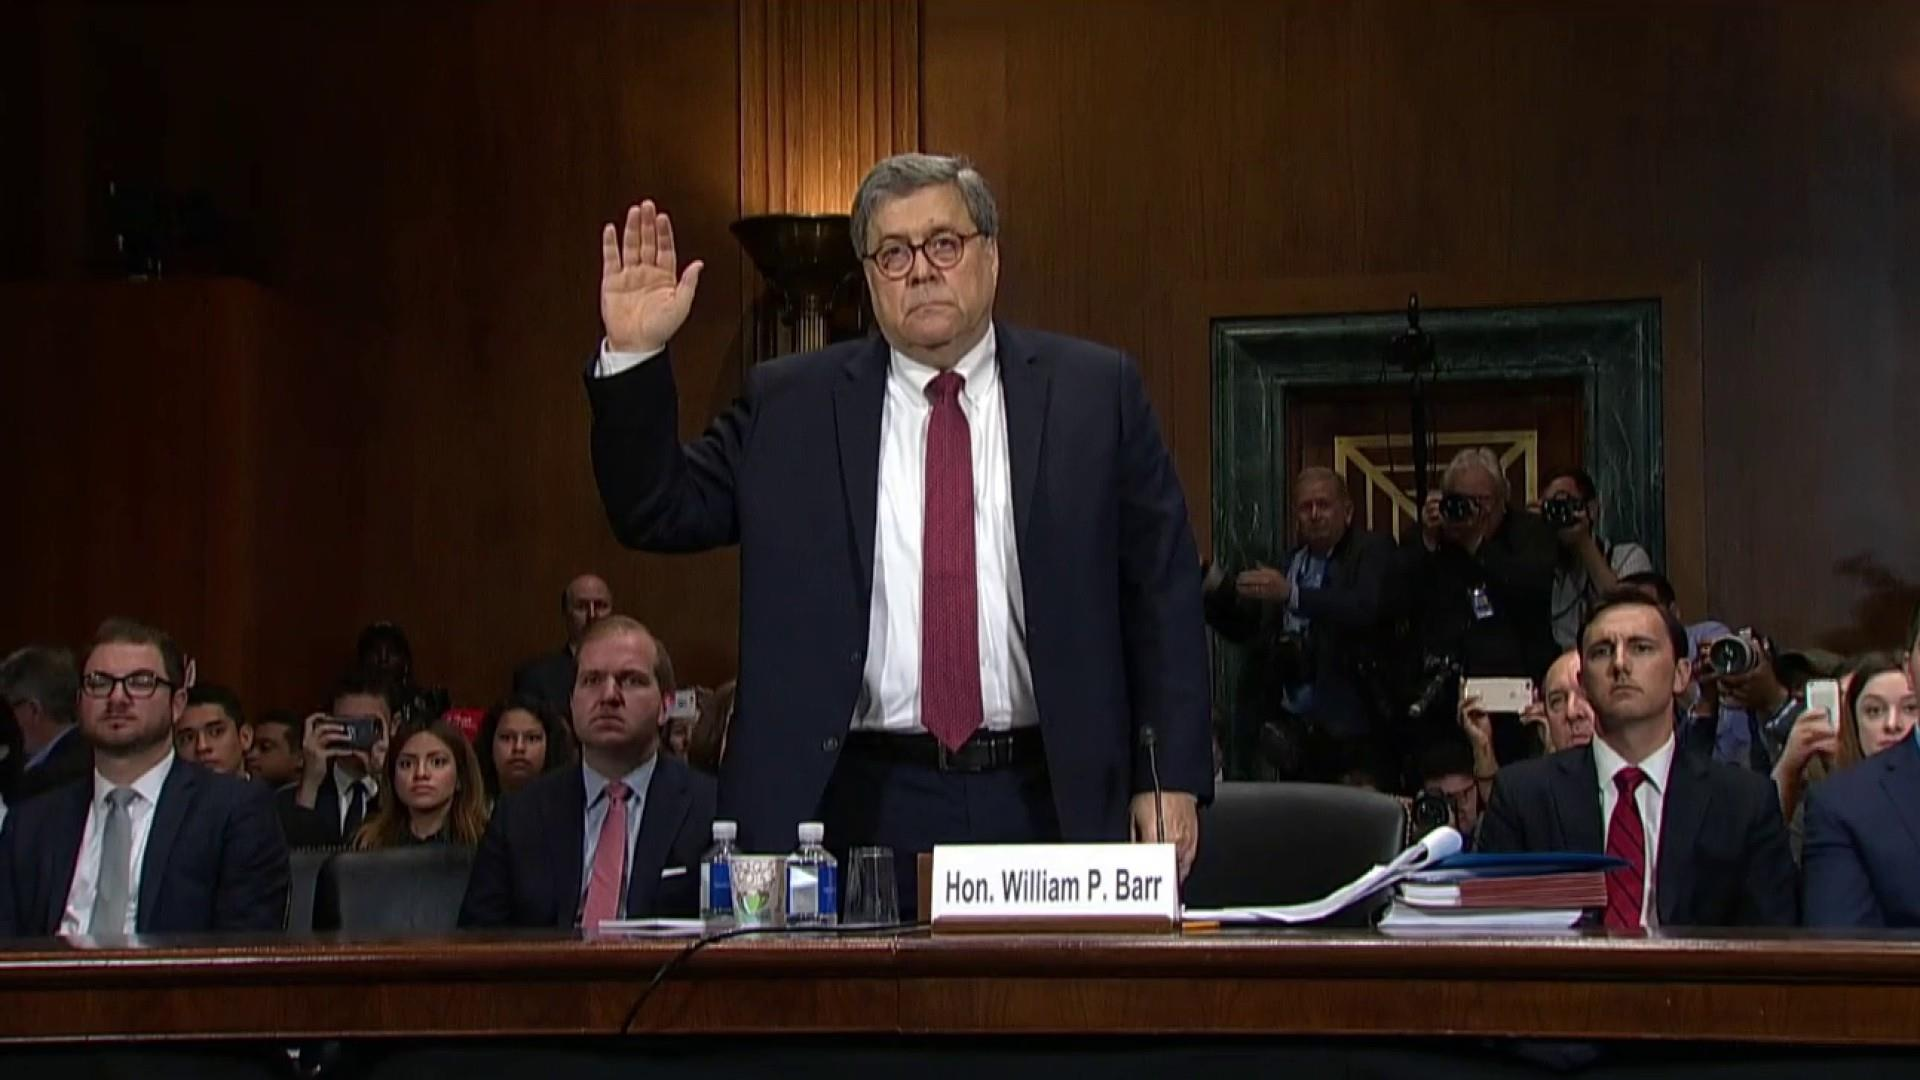 What did William Barr's Senate testimony reveal?